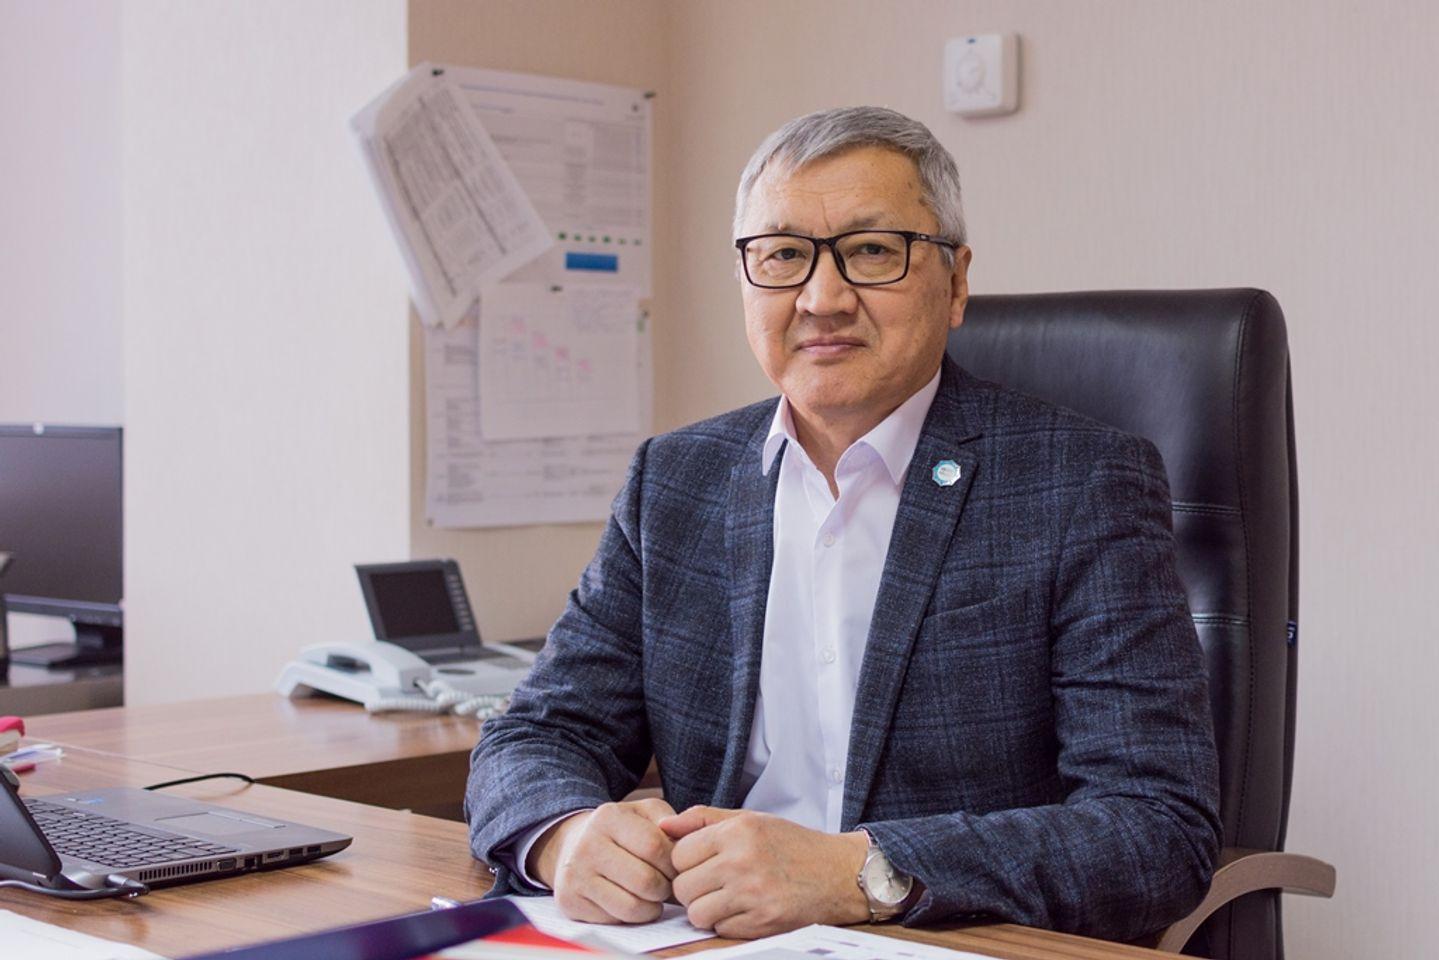 На фото: главный директор по трансформации бизнеса Центра по трансформации бизнеса АО «KEGOC» Хабибулла Казиев